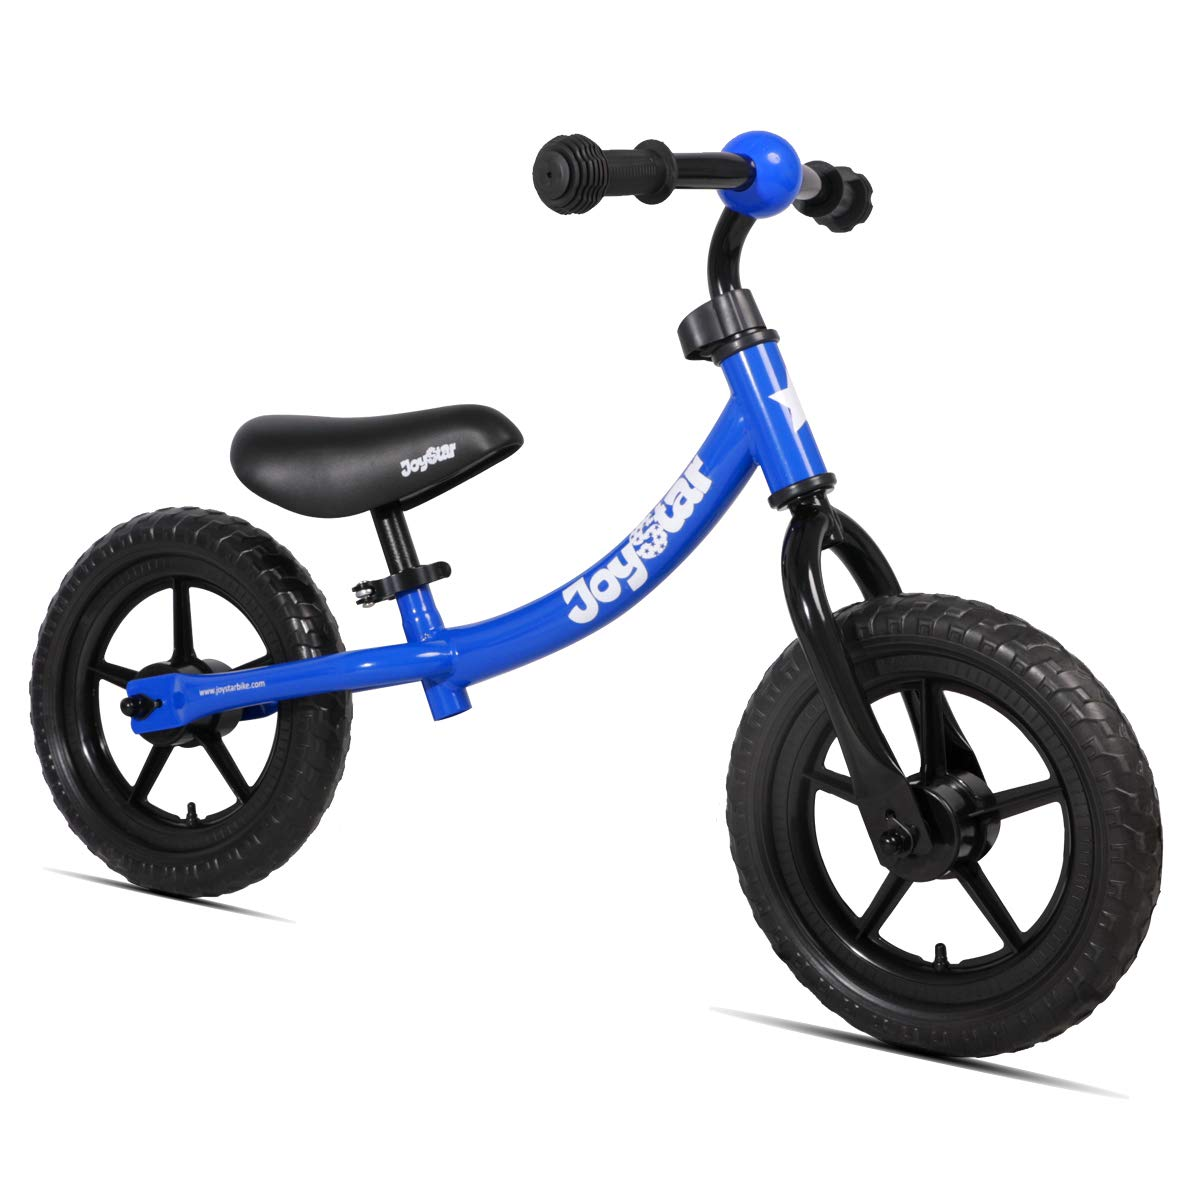 JOYSTAR Balance Bike for 1.5-5 Years Boys, Toddler Push Bike with EVA Polymer Foam Tire for Child, 12 inch Kids Glider Bike, Children Slider Cycle, Kids Pedalless Bike, Blue